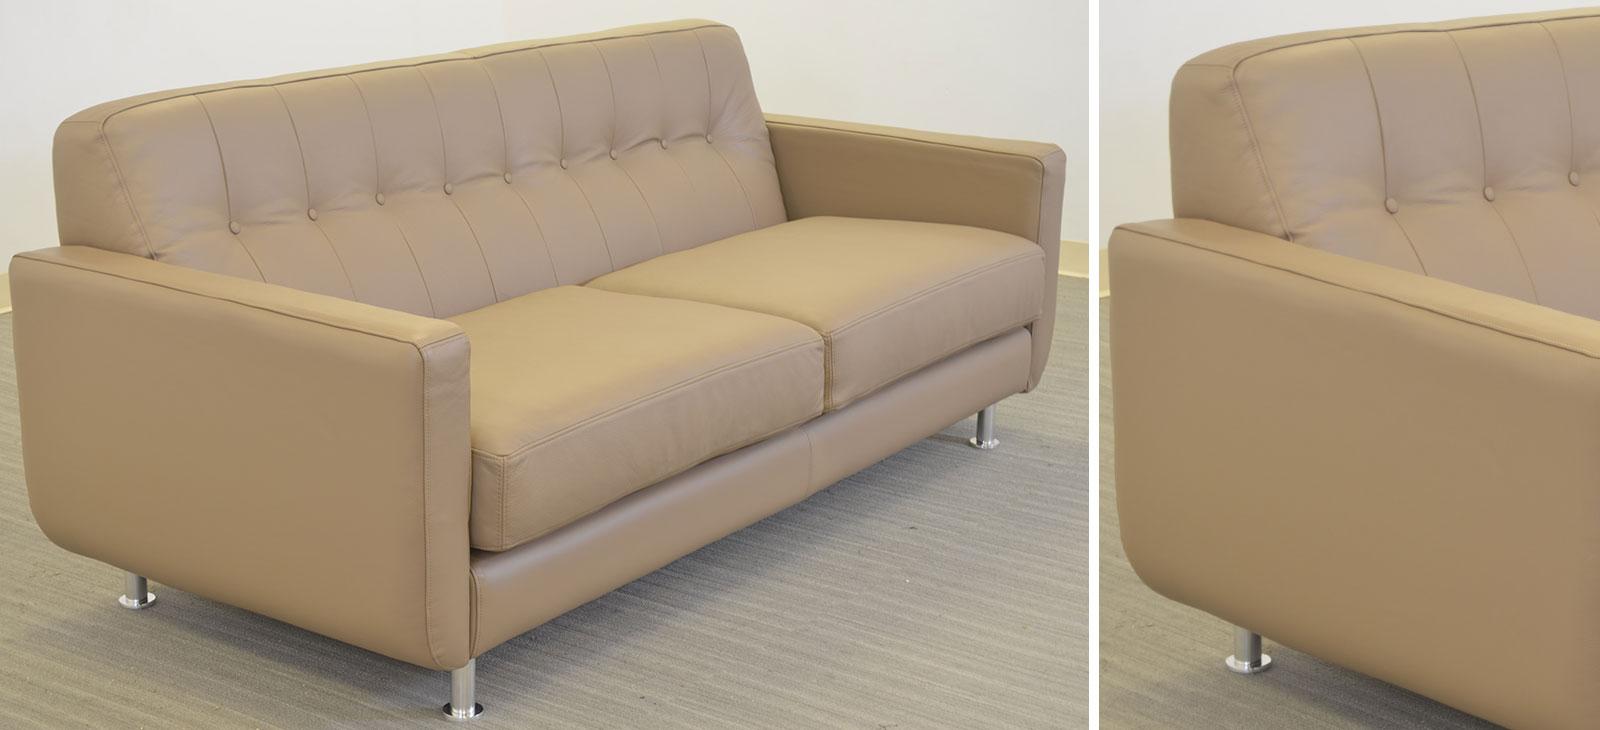 Greta Sofa ‹‹ The Leather Sofa pany